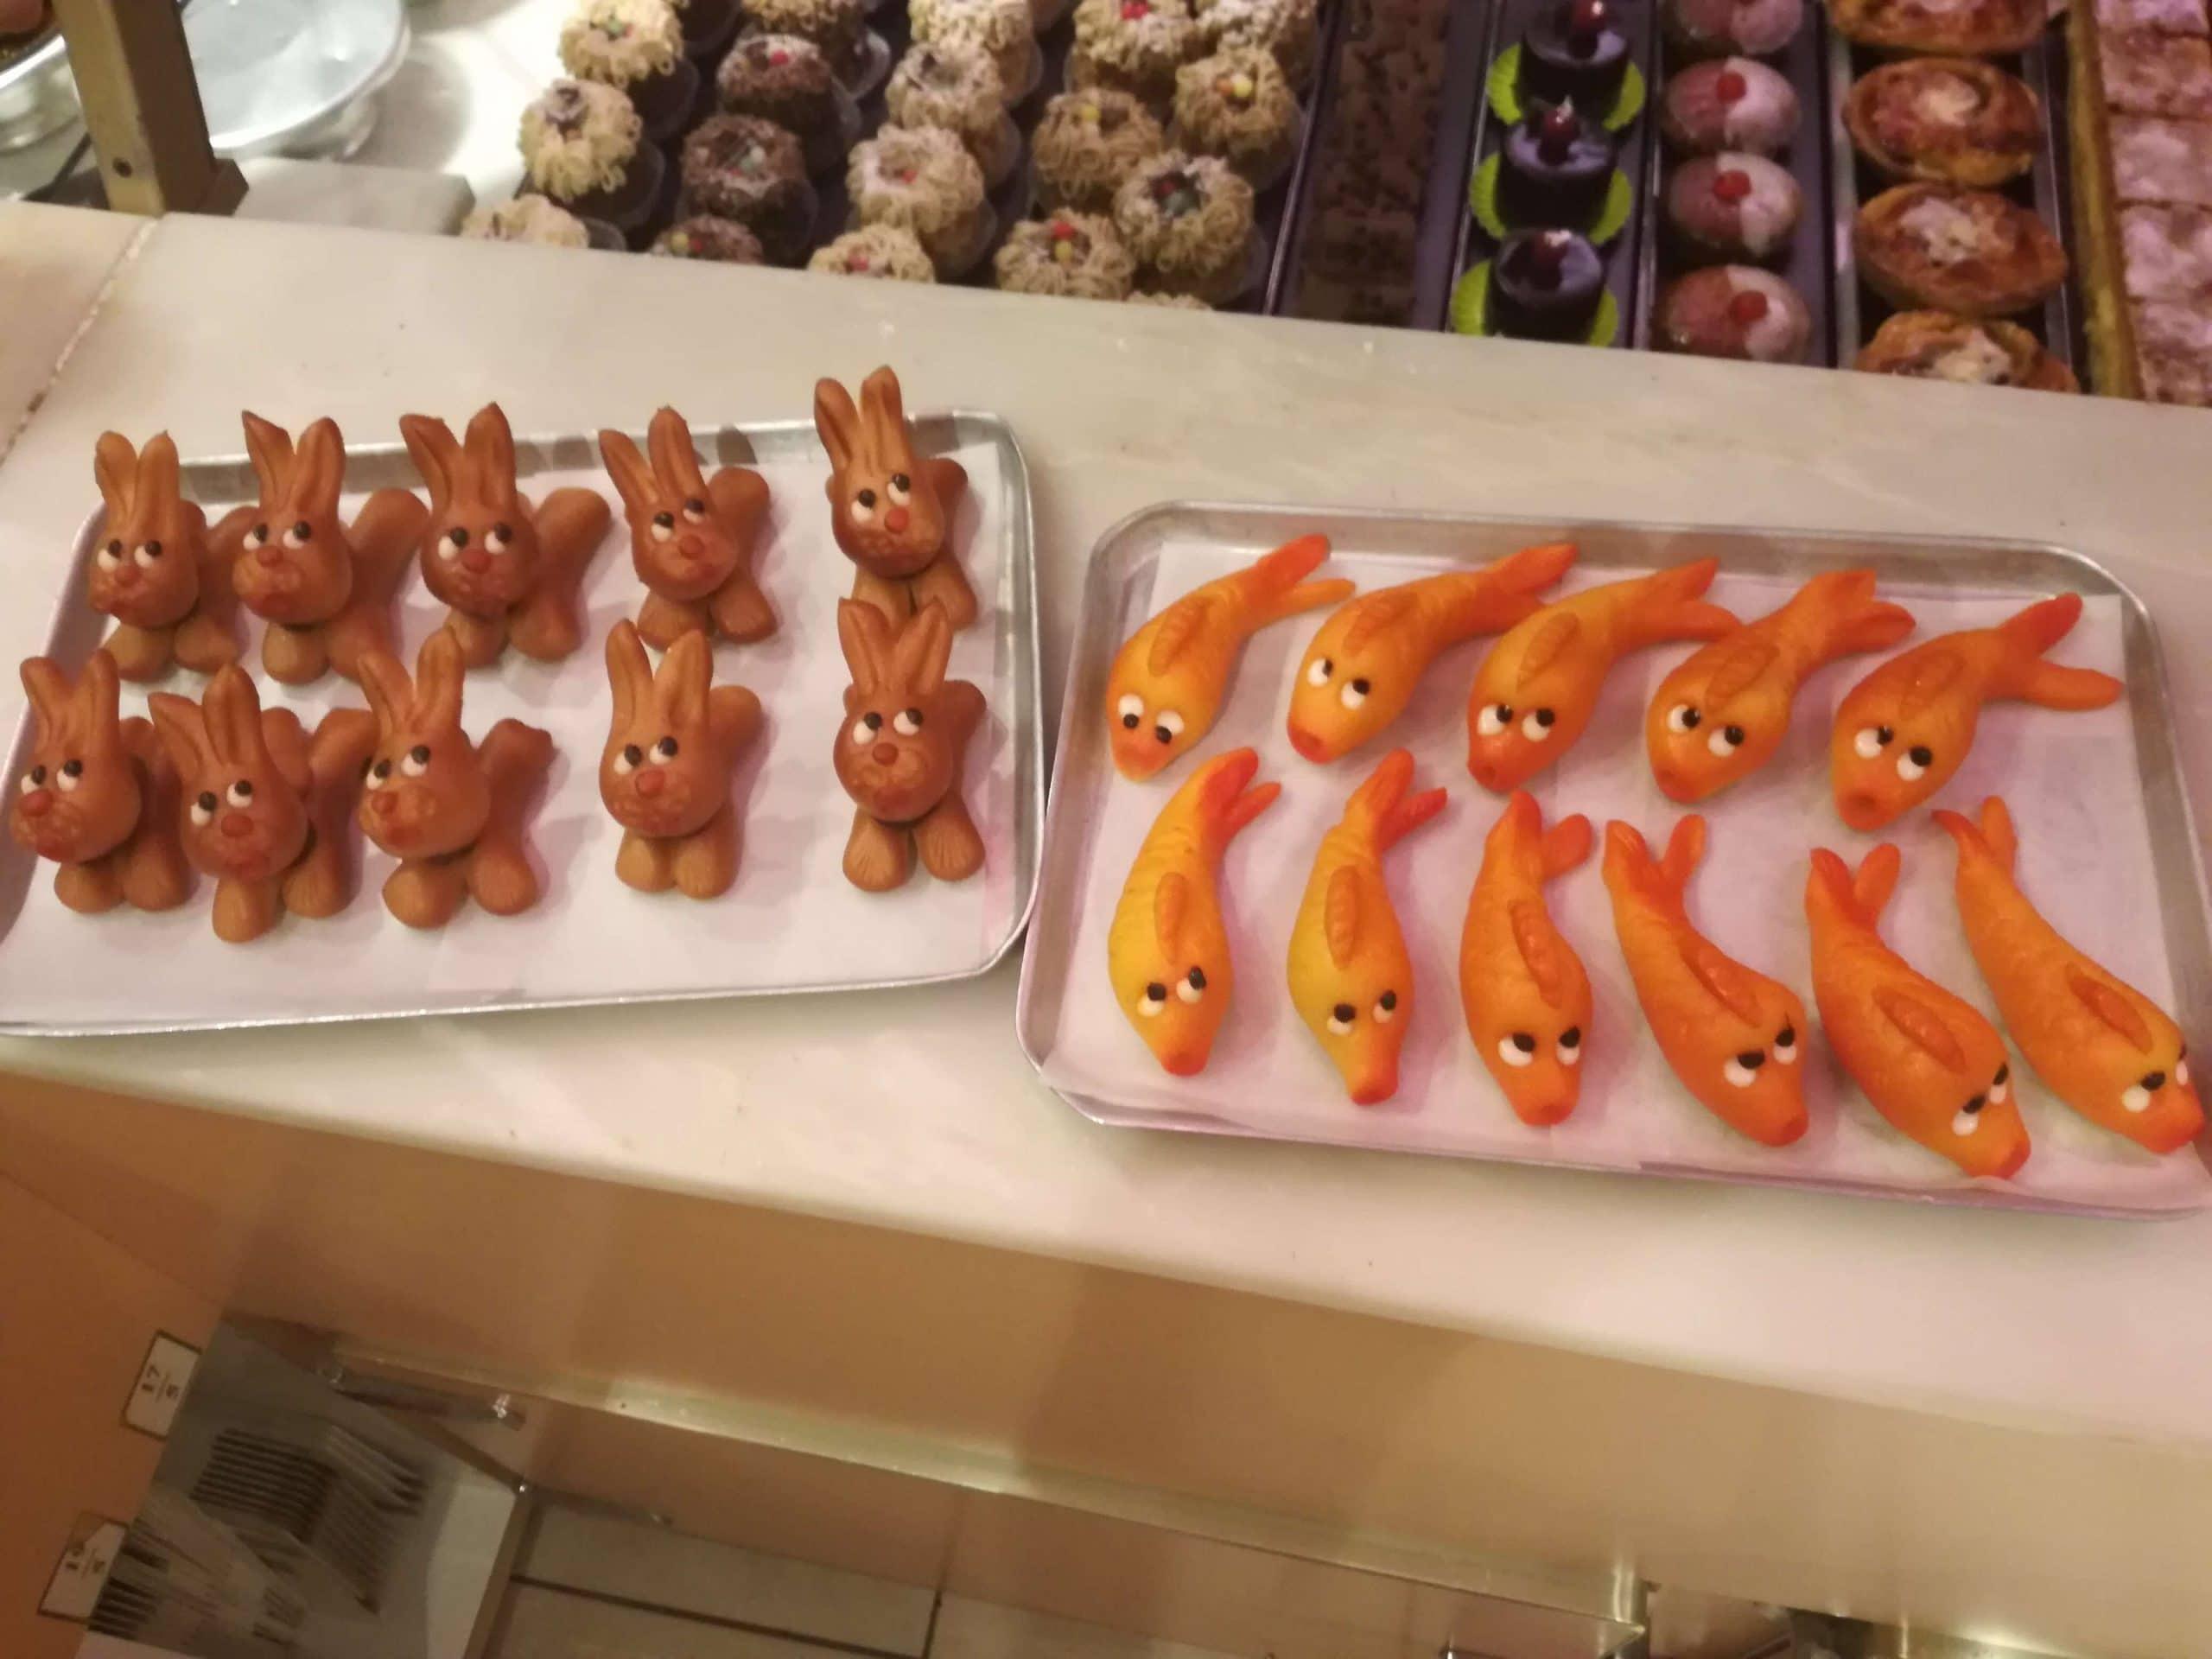 boulanger-1-specialiste-patisseries-liege